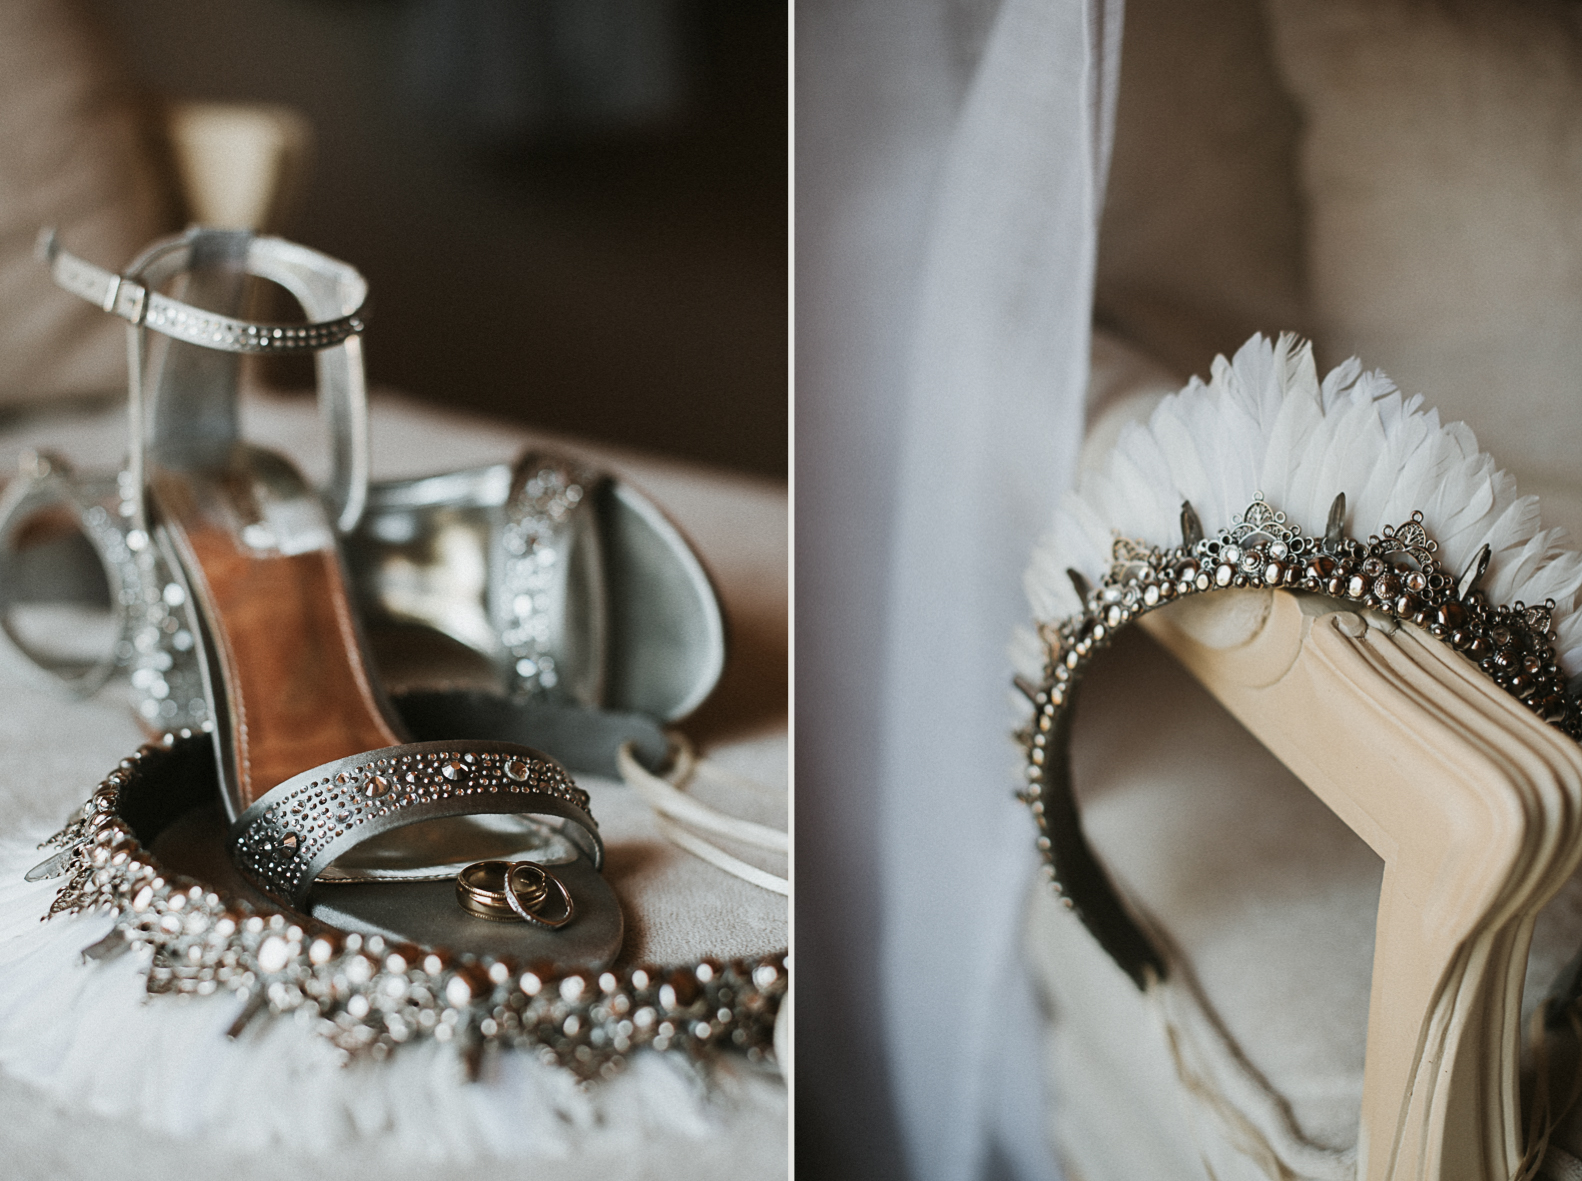 miks-sels-mas-terrats-girona-wedding-photographer-11.1